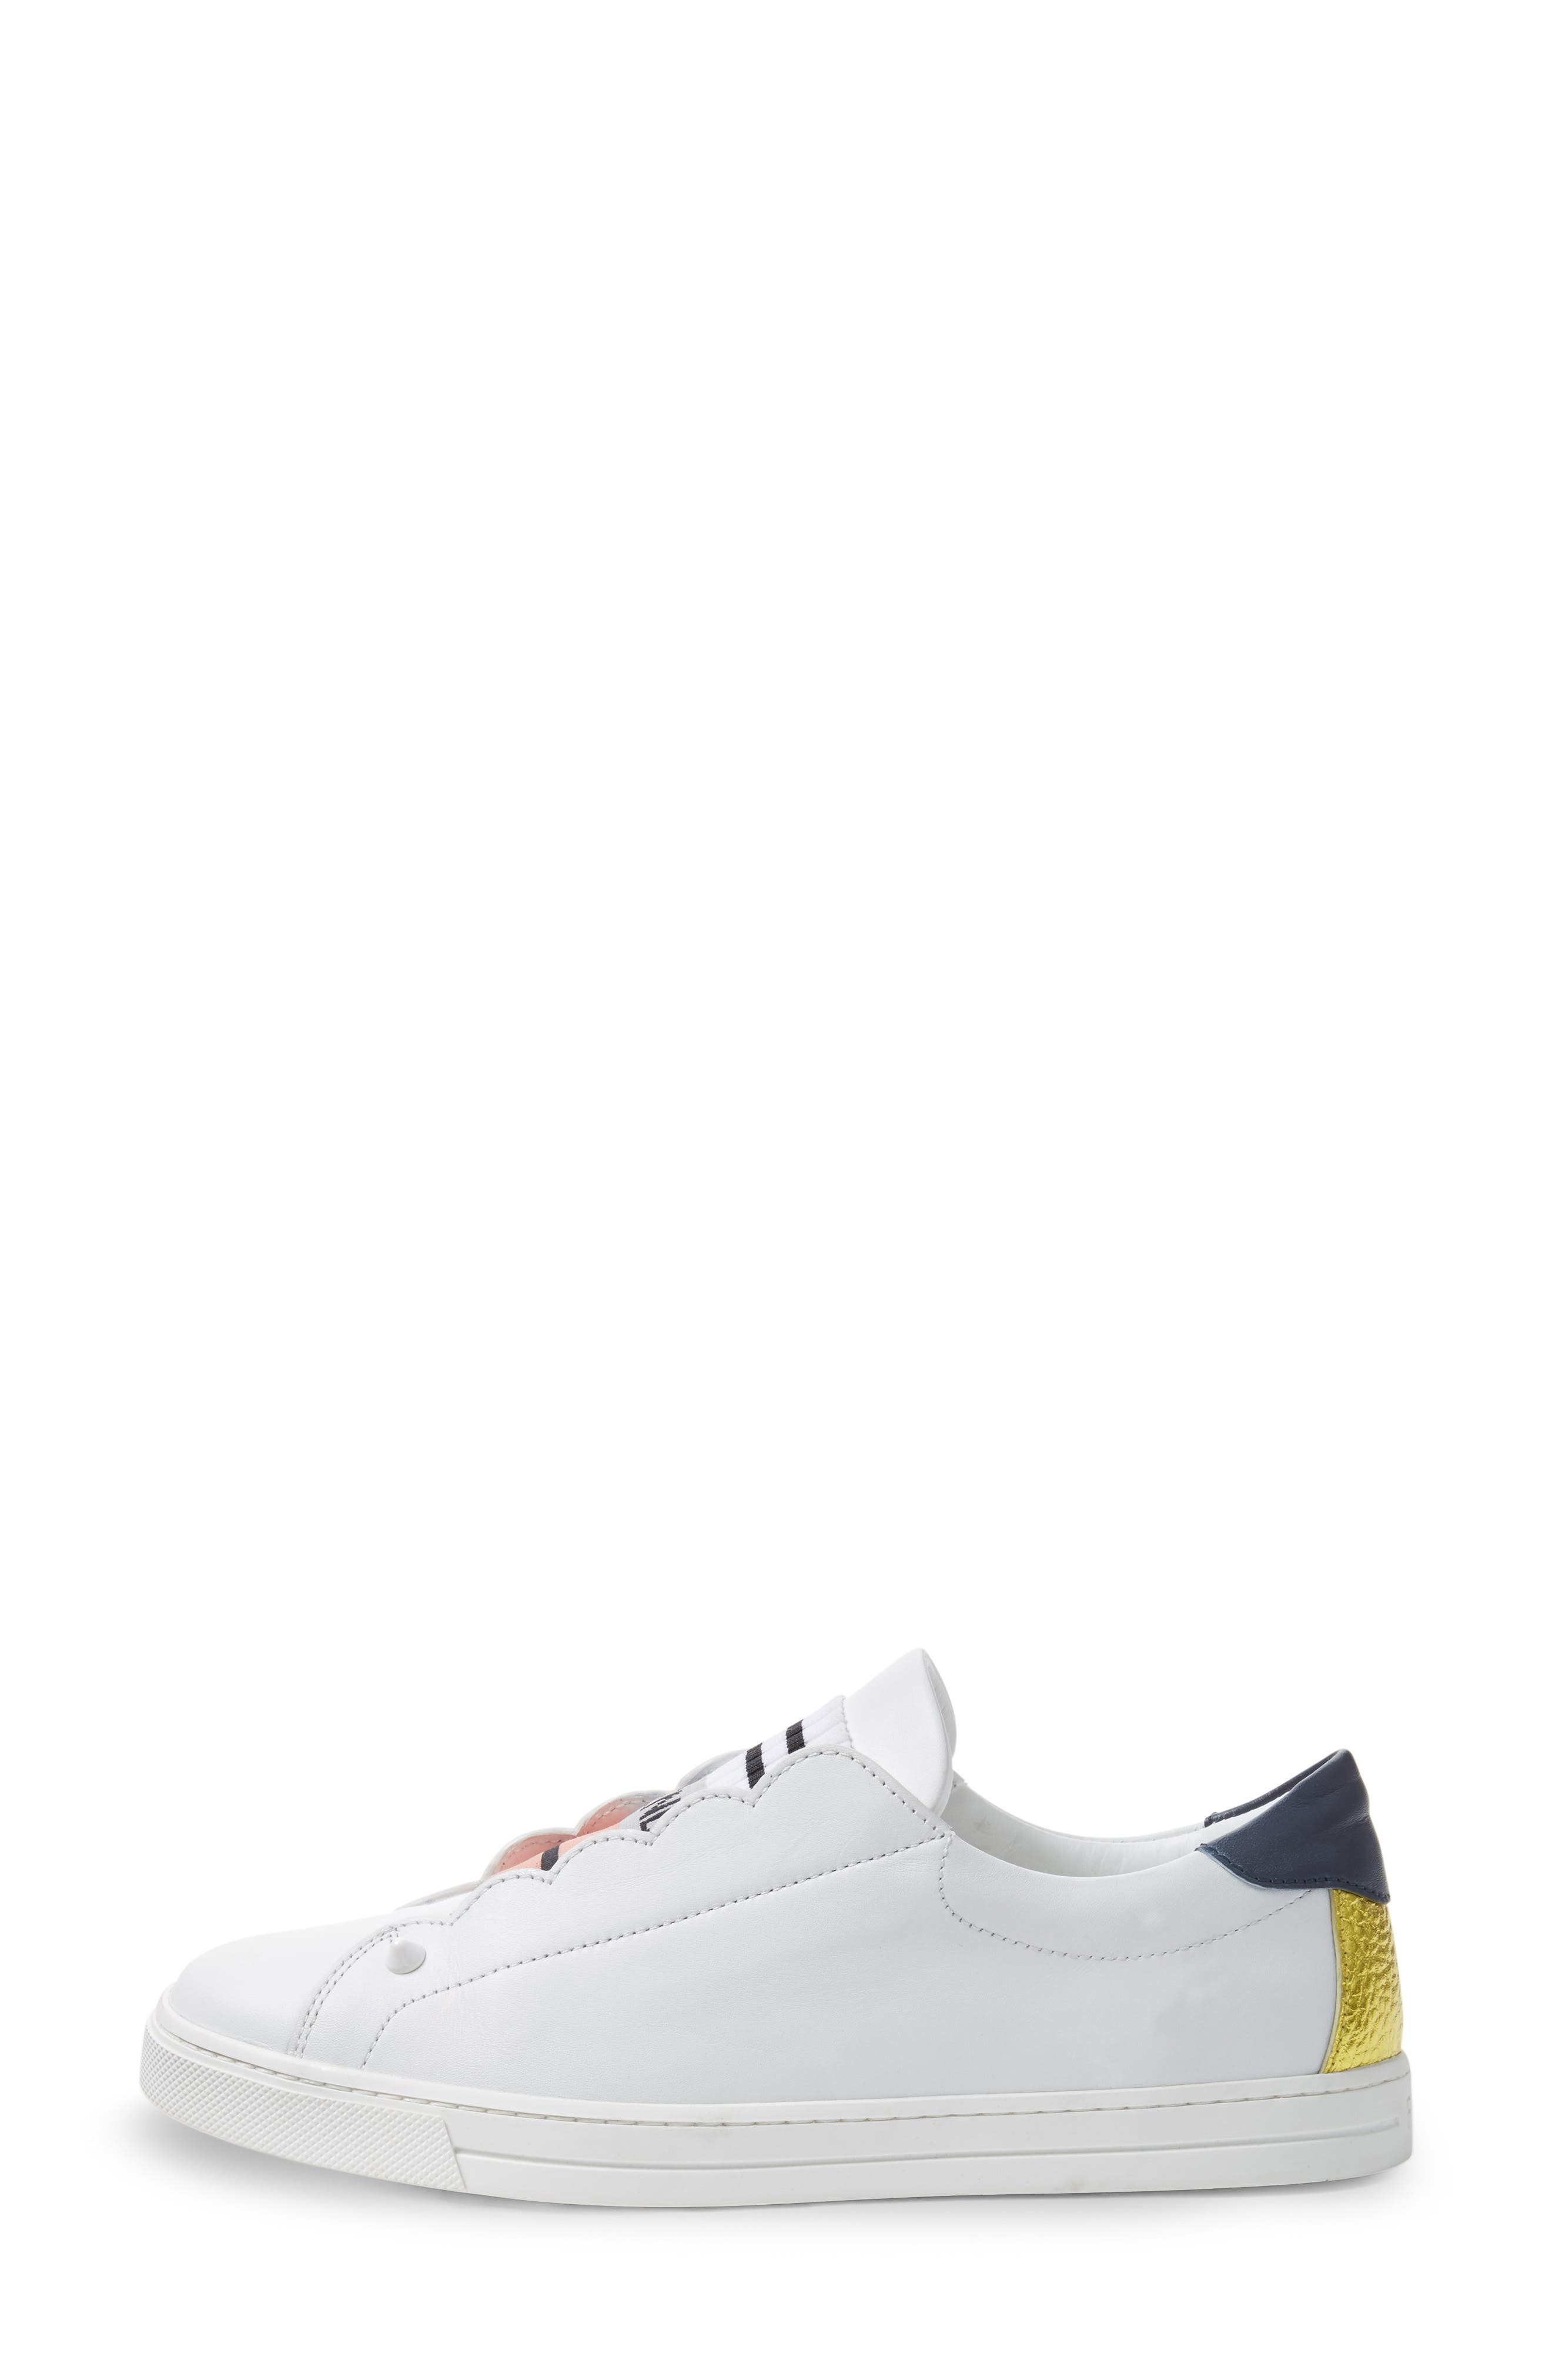 Alternate Image 3  - Fendi Rockoclick Slip-On Sneaker (Women)